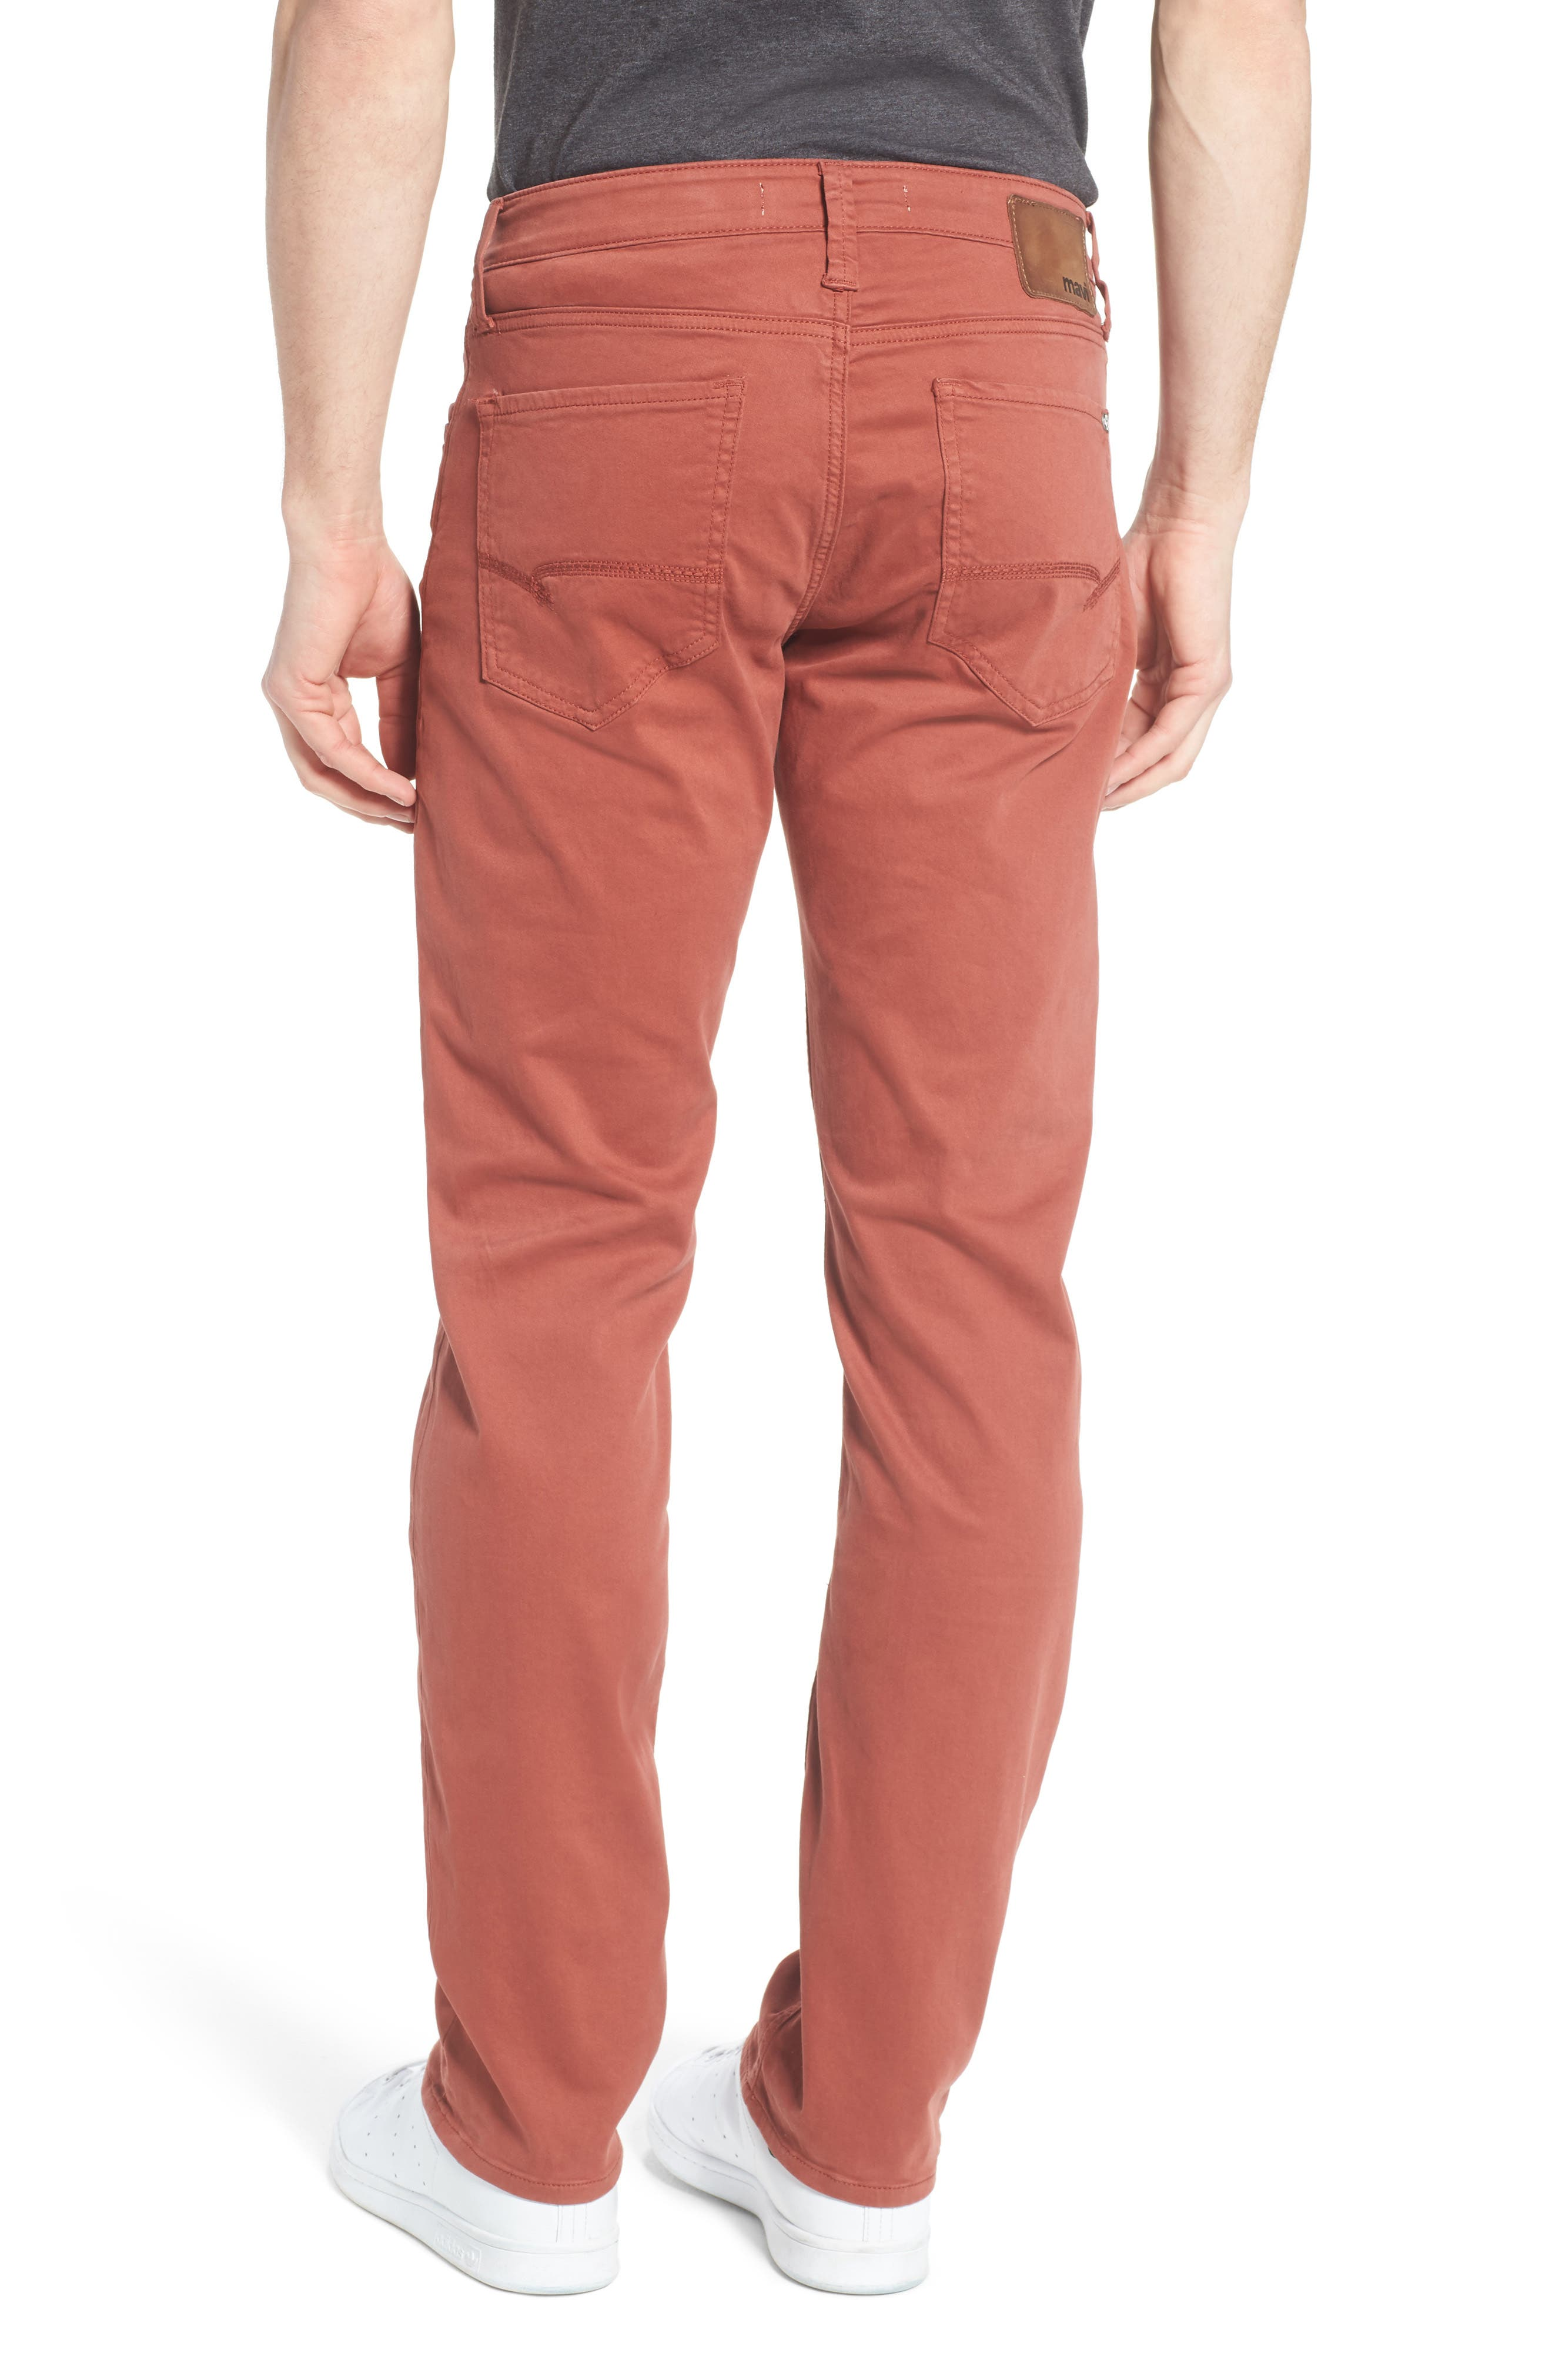 Zach Straight Leg Jeans,                             Alternate thumbnail 2, color,                             600